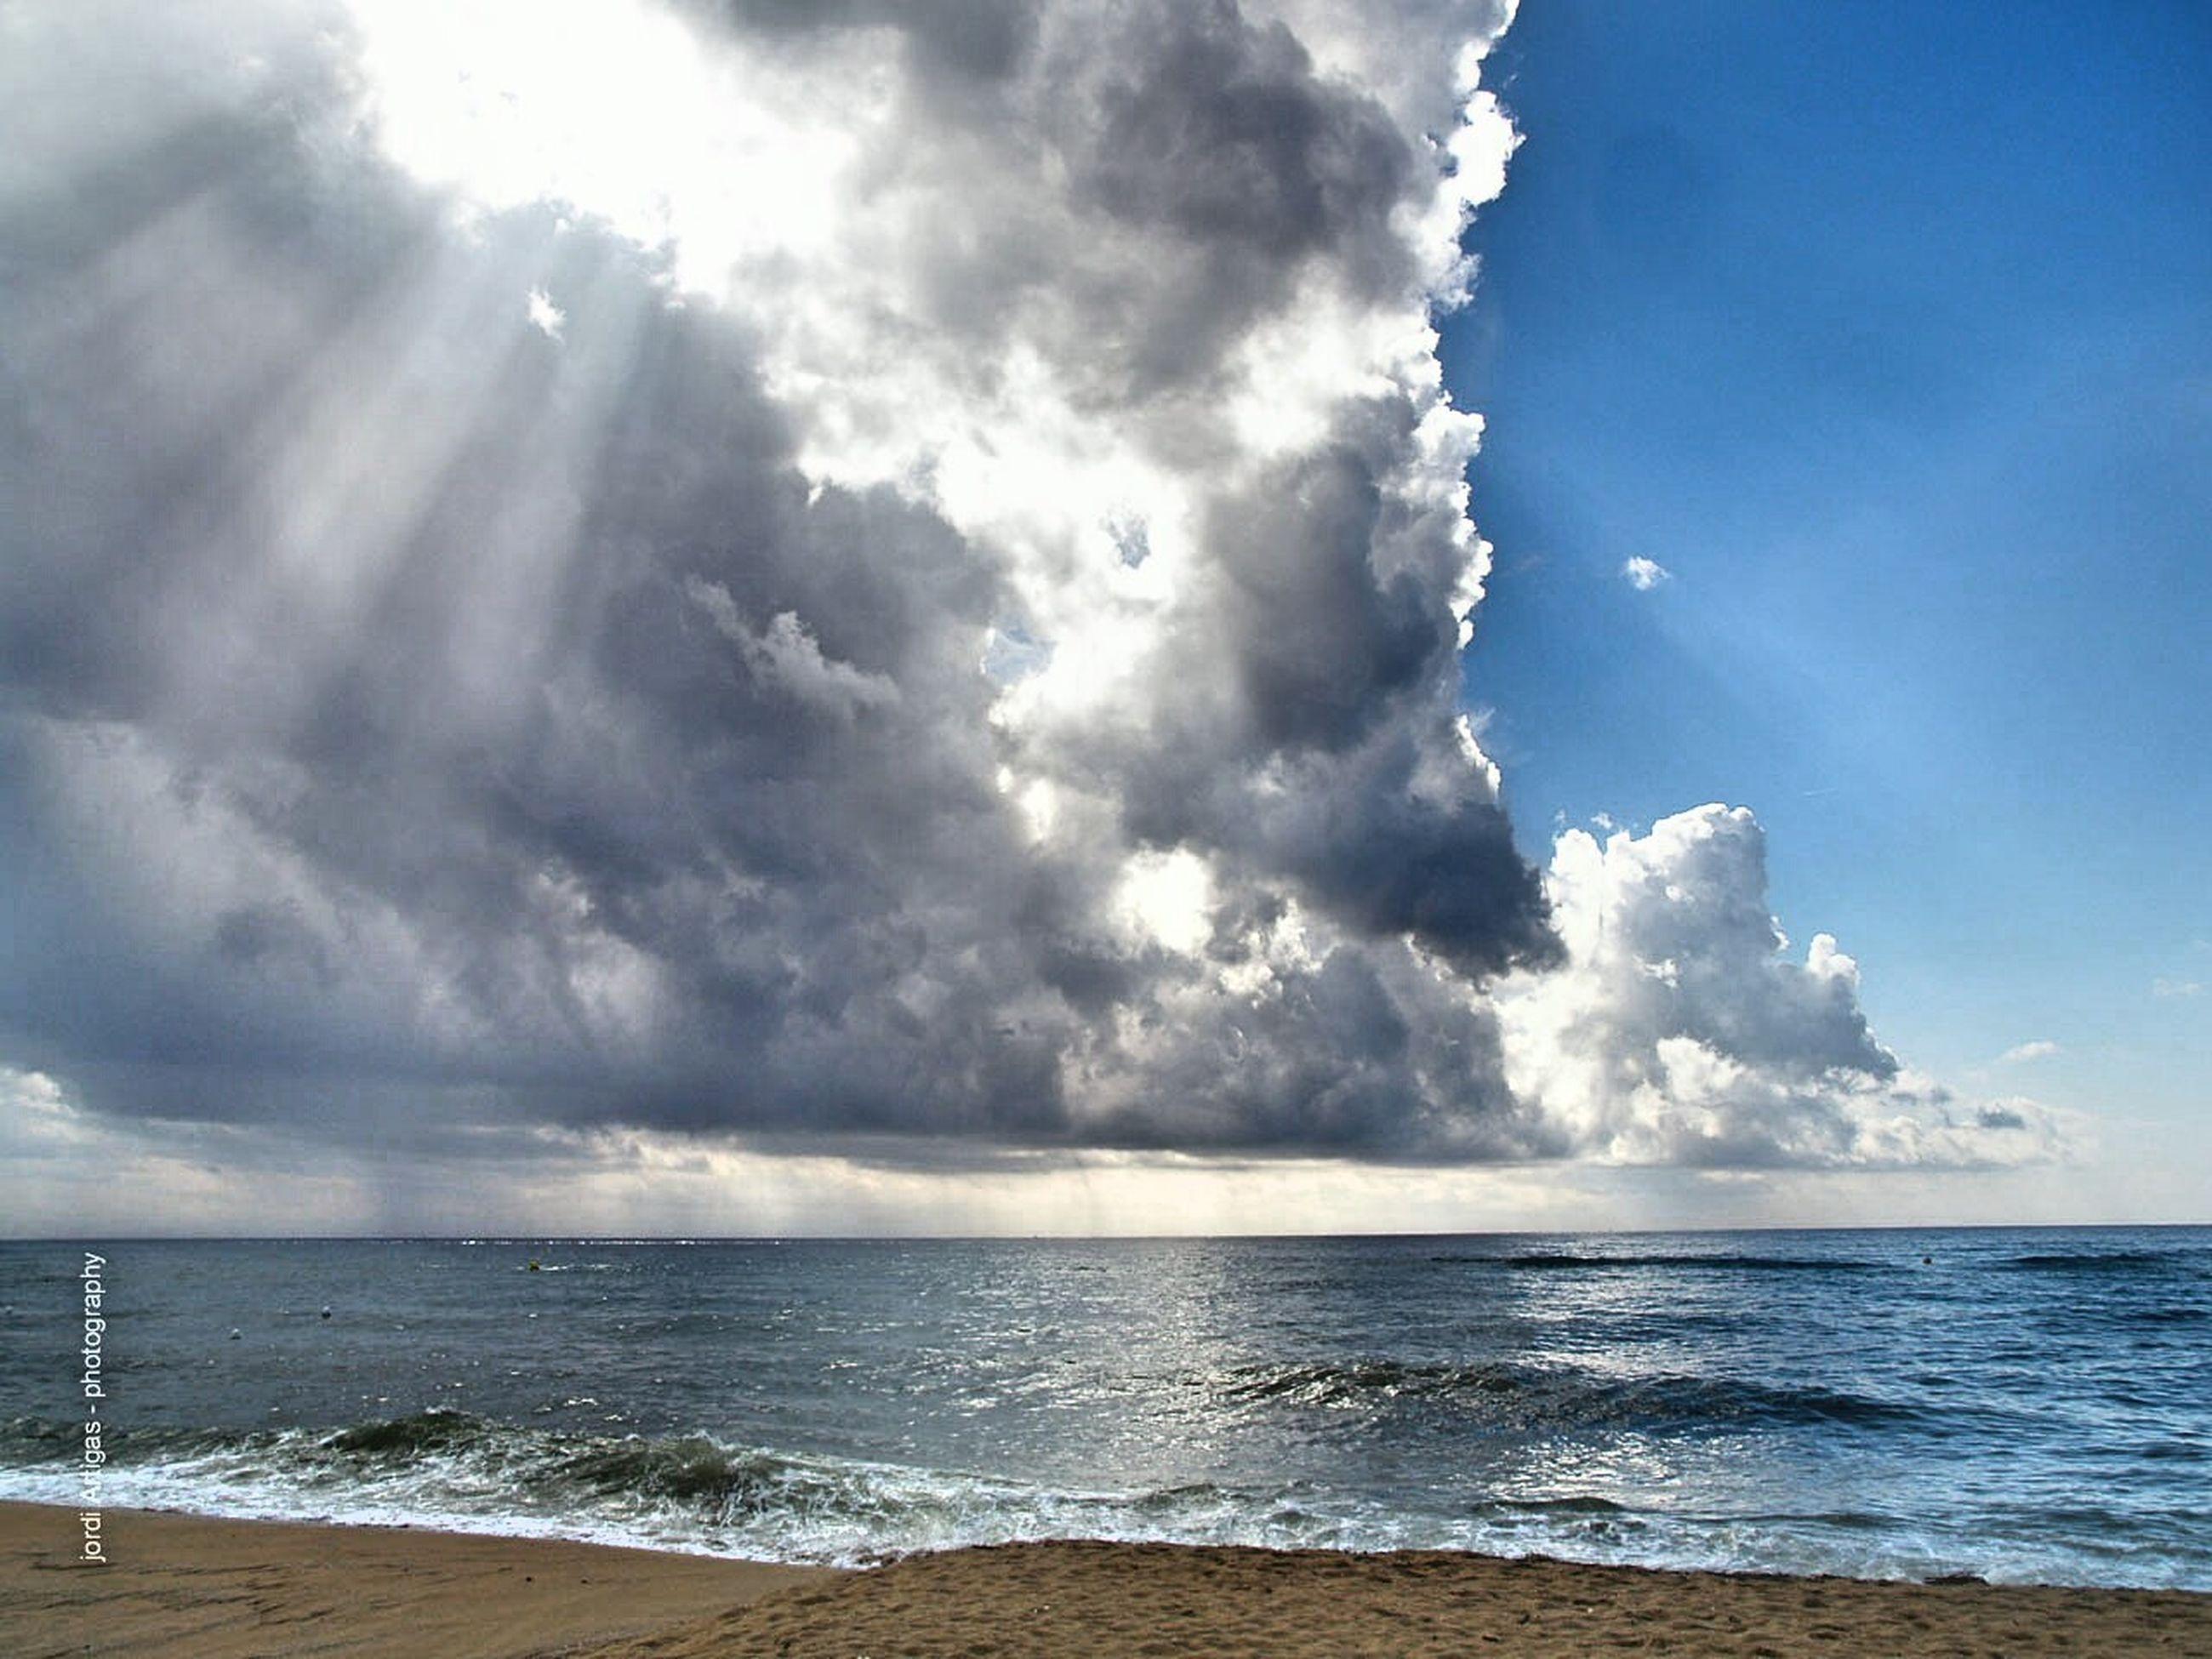 water, sea, horizon over water, beach, tranquil scene, scenics, tranquility, sky, beauty in nature, blue, idyllic, calm, shore, cloud, nature, seascape, non-urban scene, majestic, ocean, coastline, day, wave, outdoors, remote, vacations, cloud - sky, summer, tourism, coastal feature, solitude, tide, no people, cloudscape